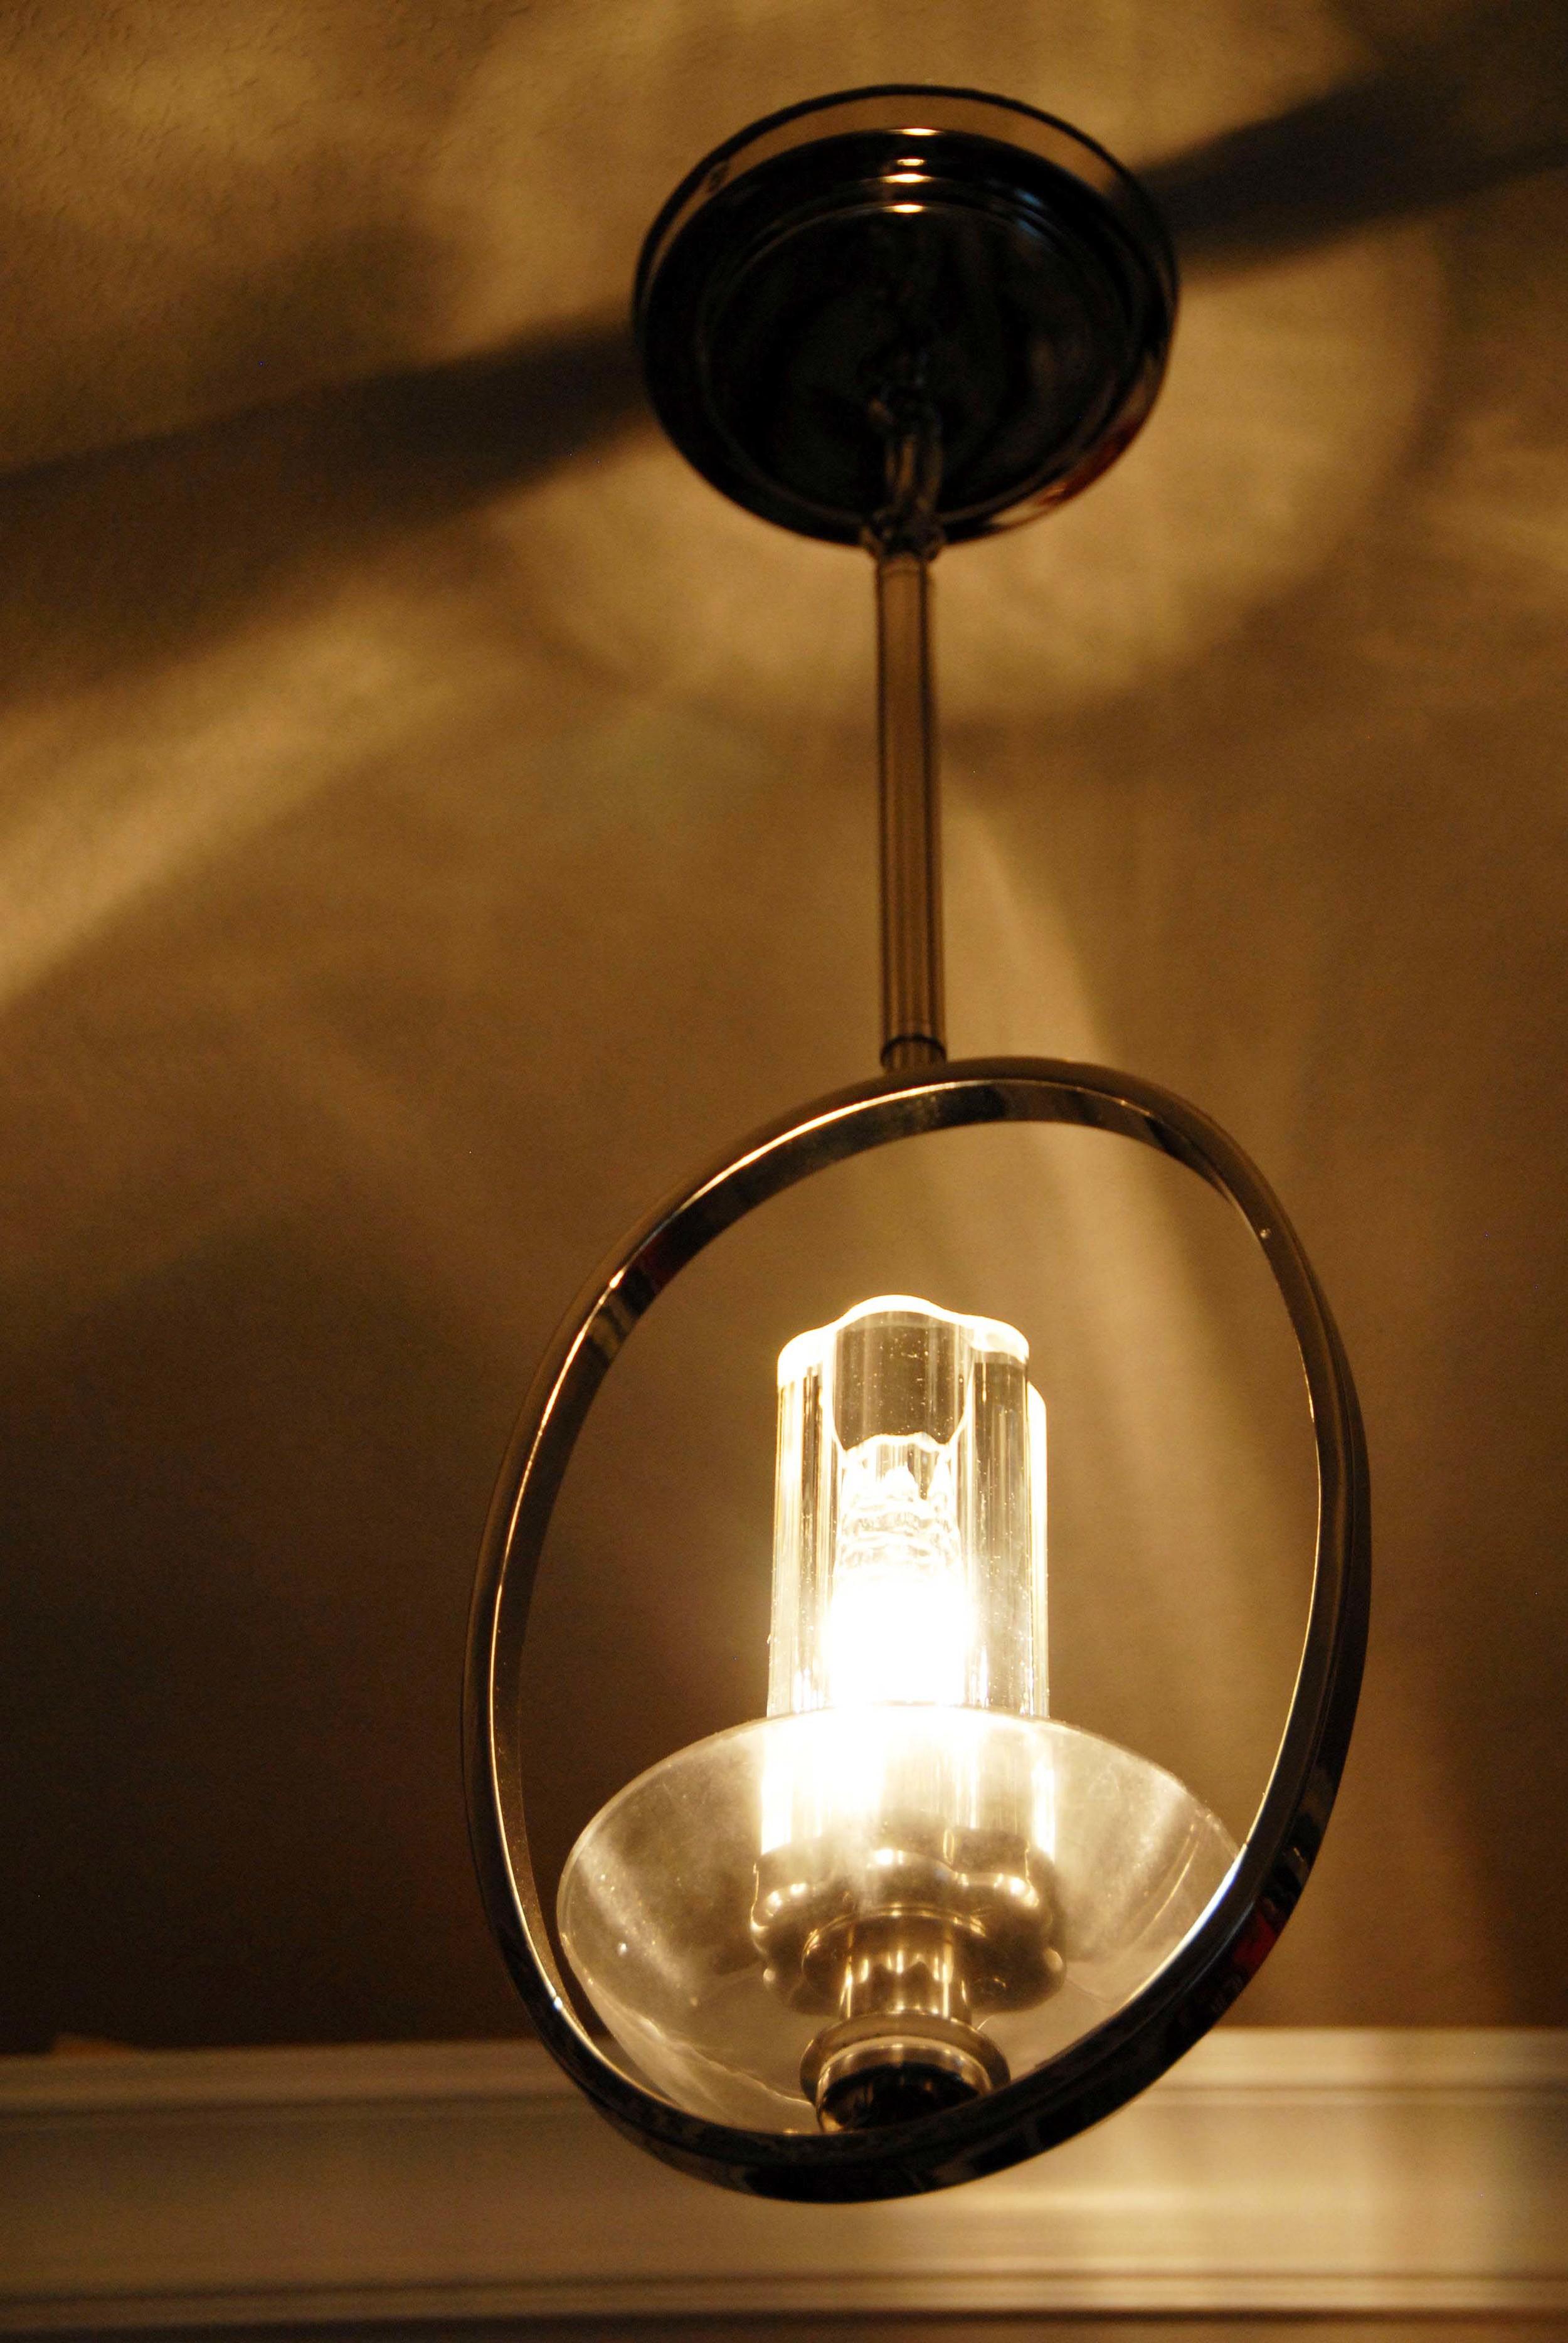 The new light on